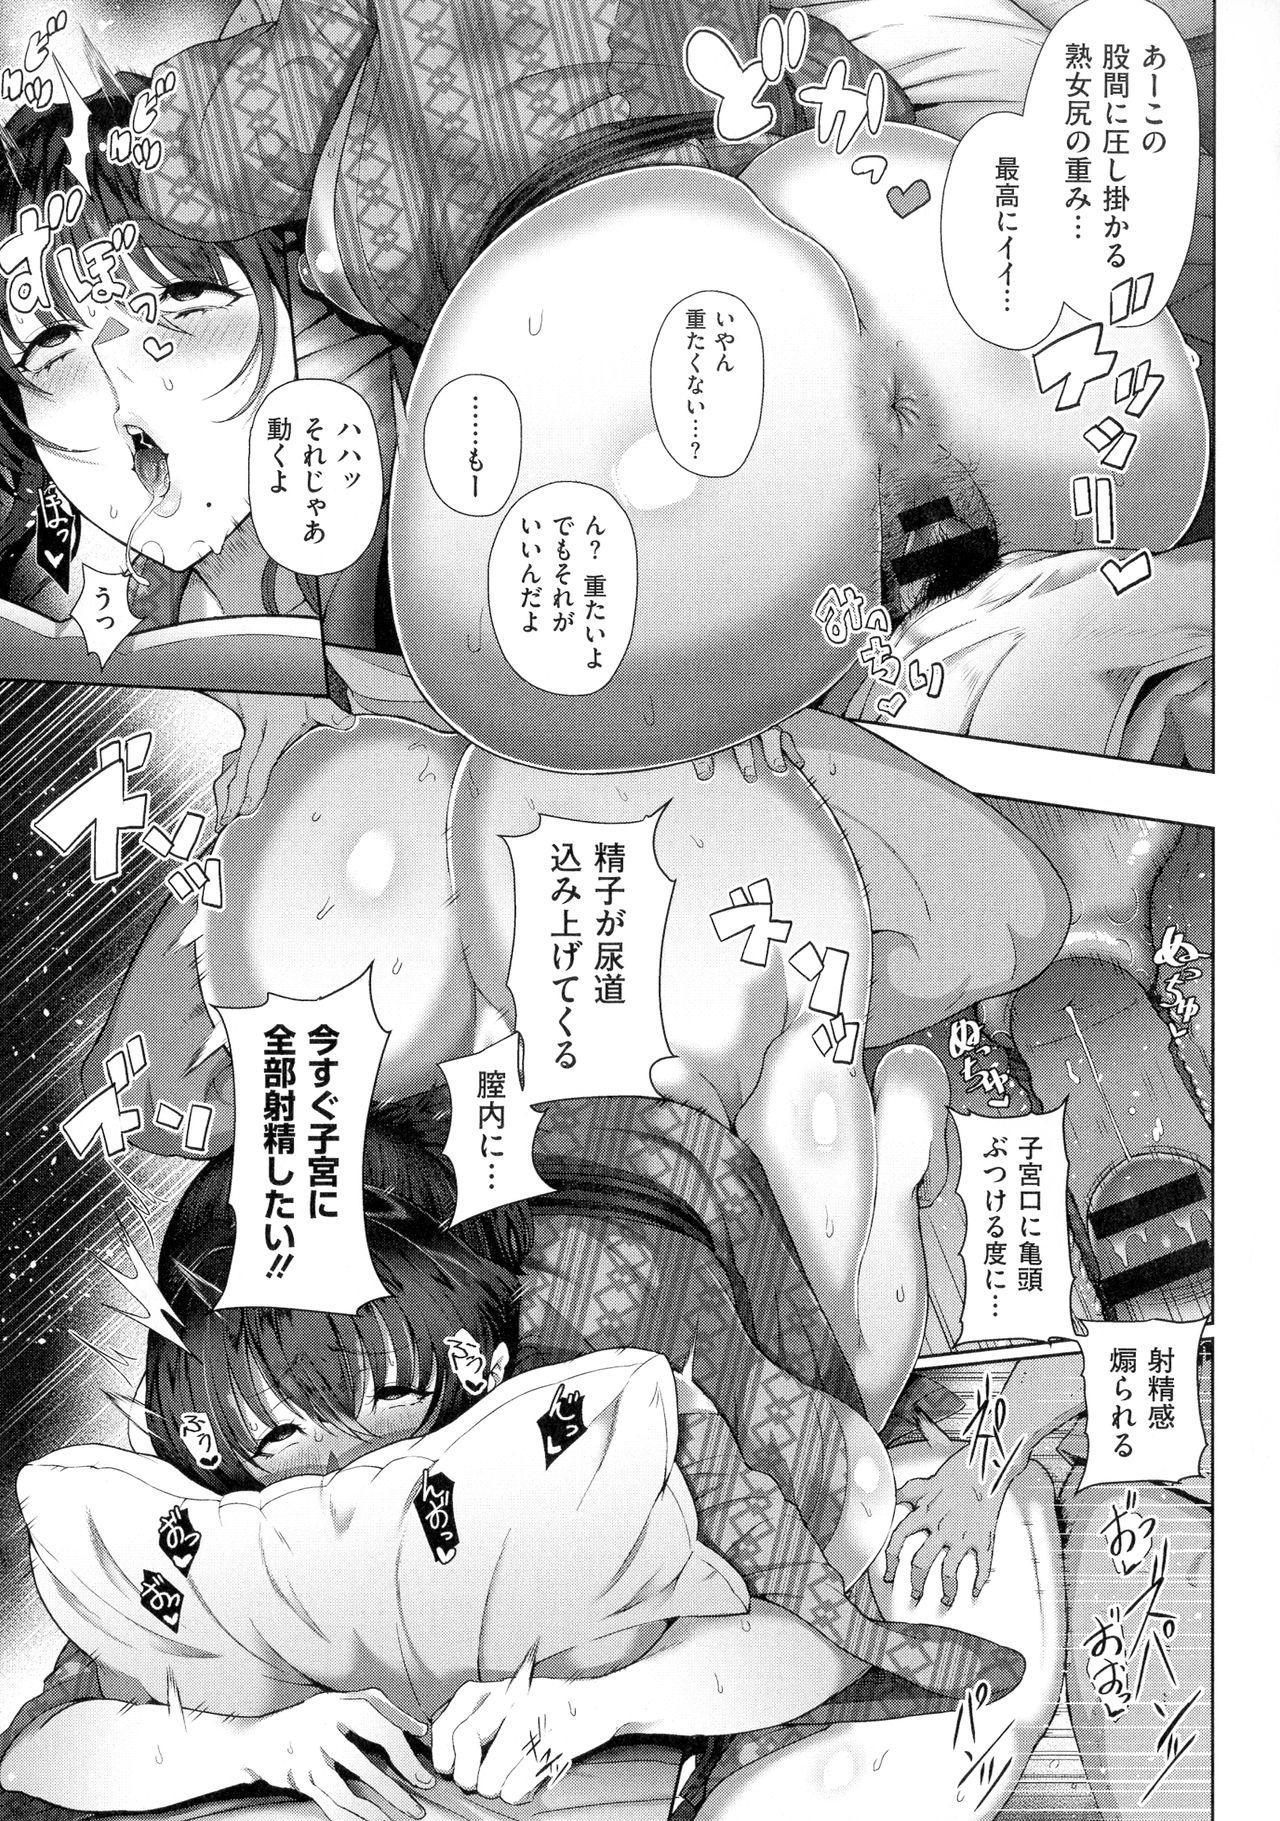 Juku Mesu - Erotic Mature Women 29